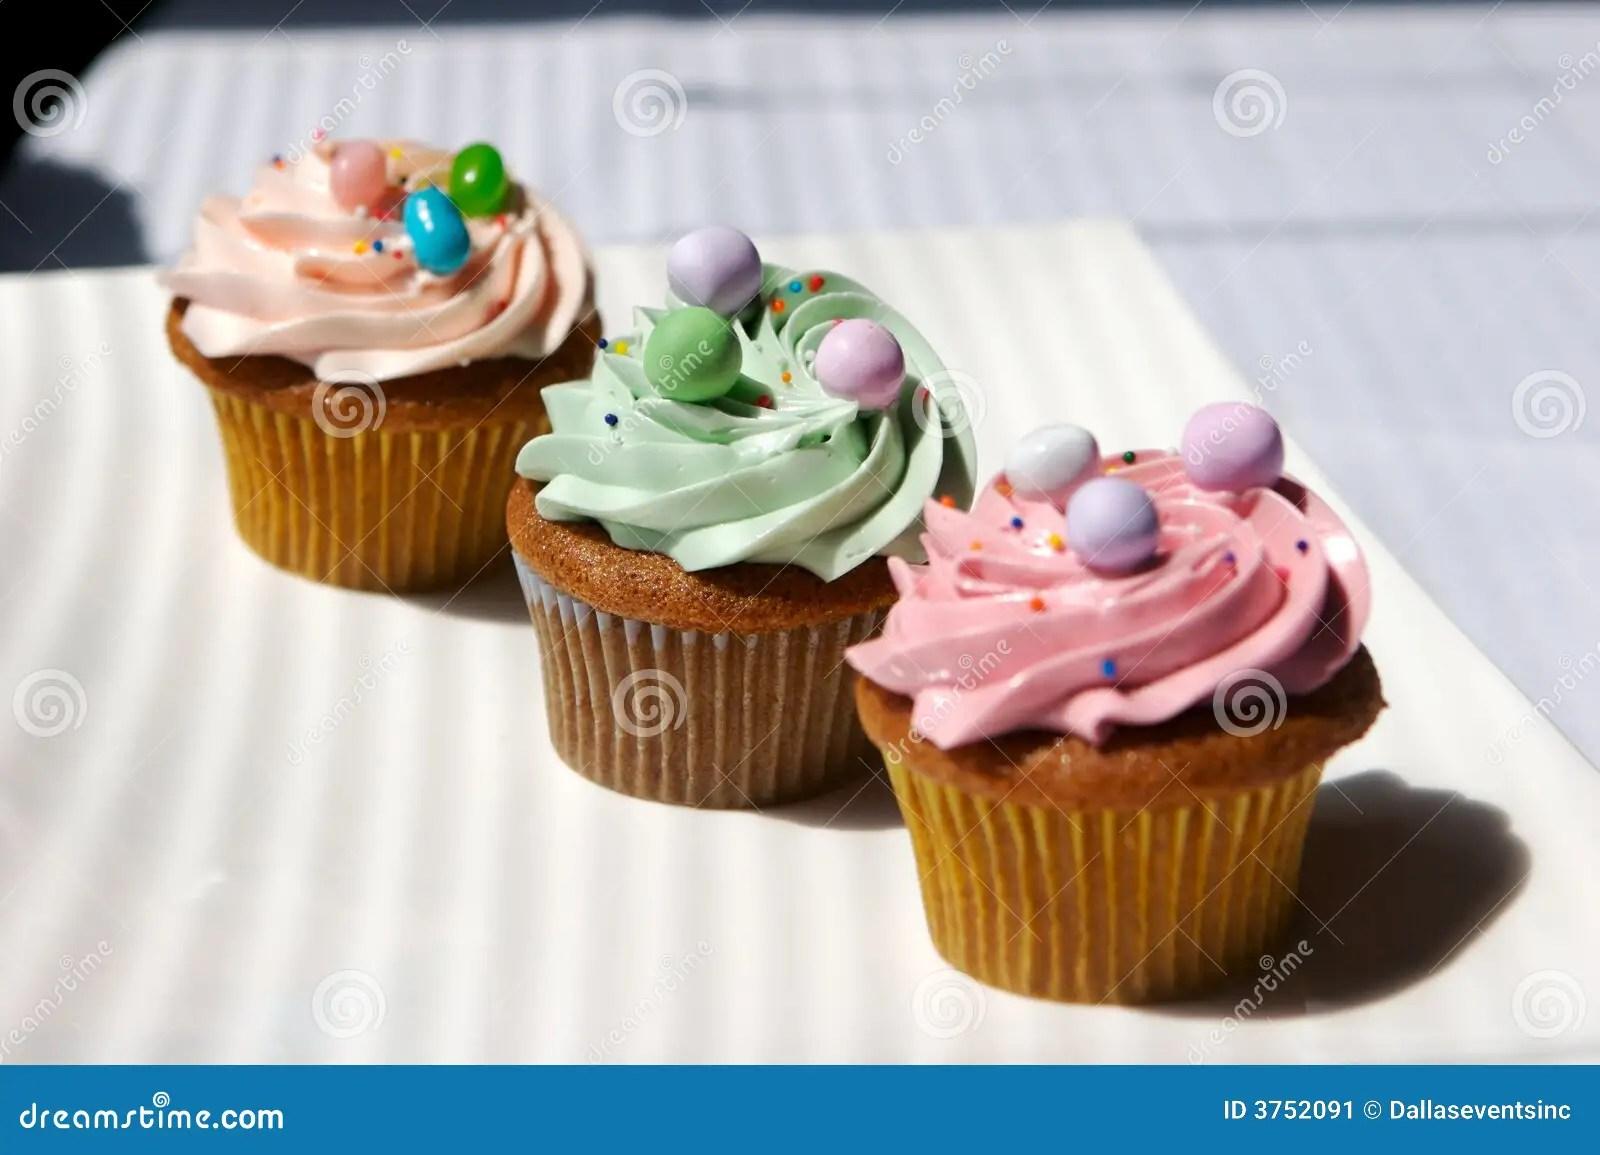 Feinschmecker Verzierte Kleine Kuchen Stockbild  Bild